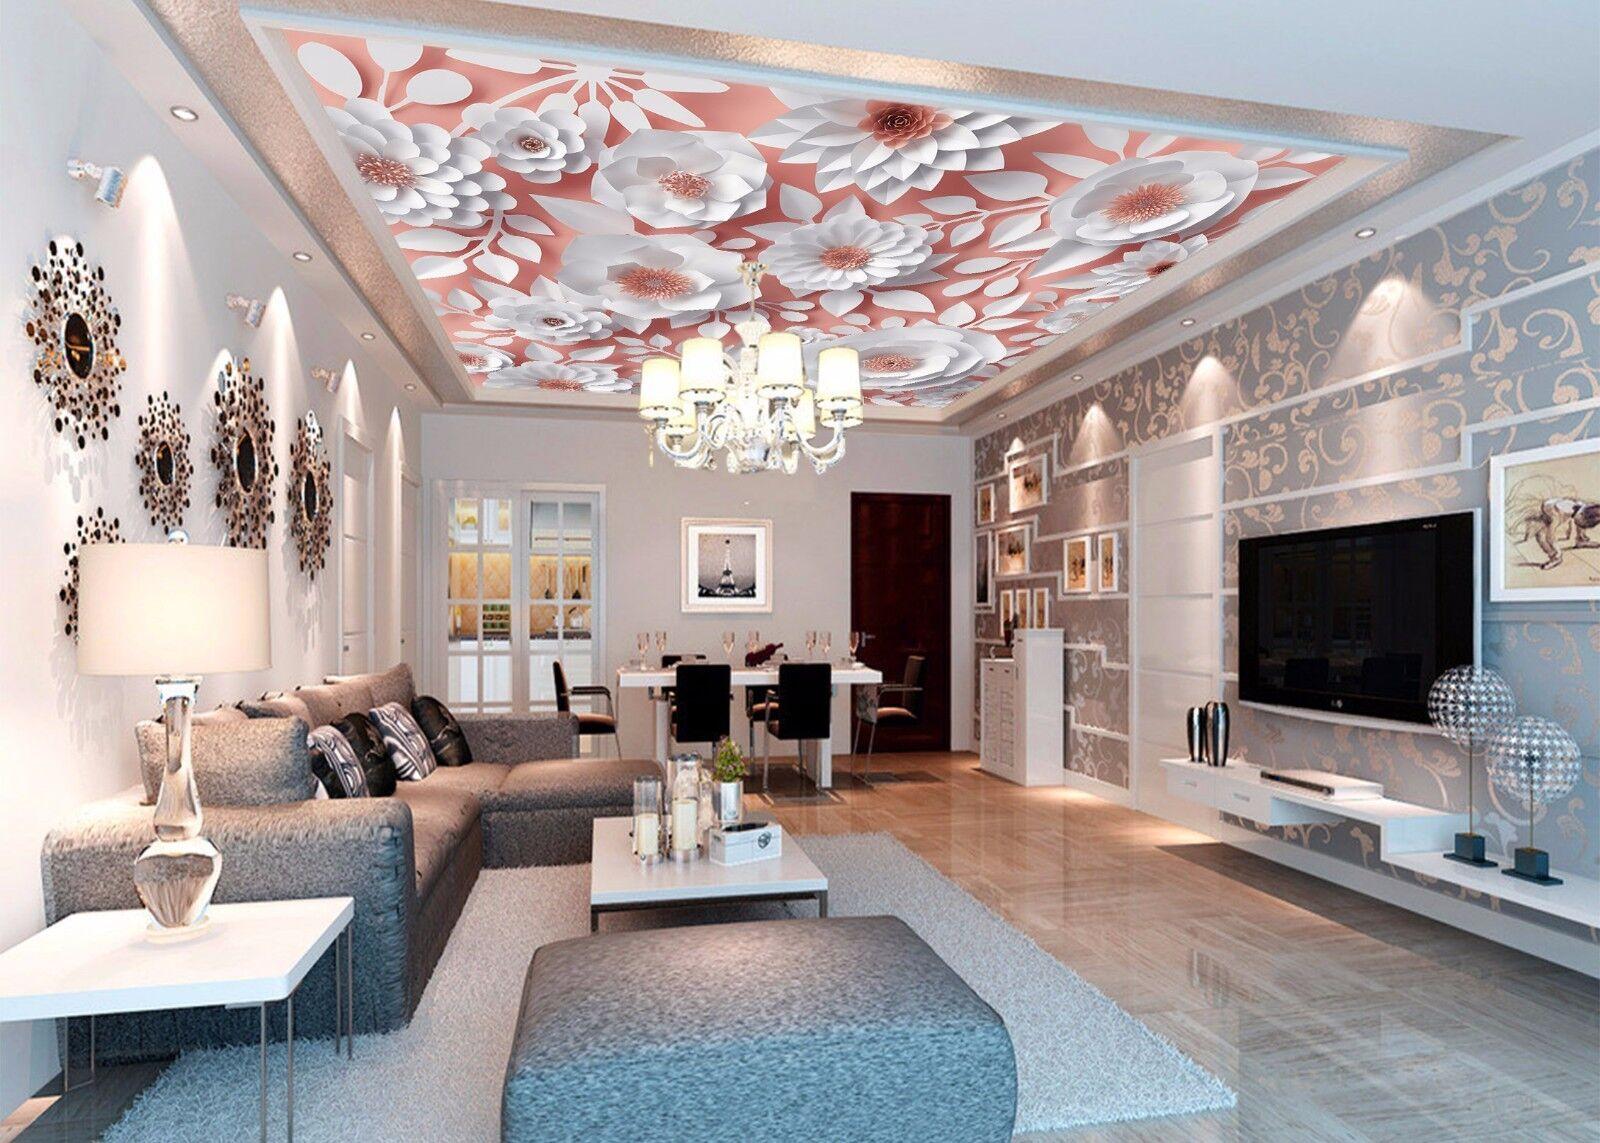 3D Weiß Flower 7 Ceiling WallPaper Murals Wall Print Decal Deco AJ WALLPAPER GB